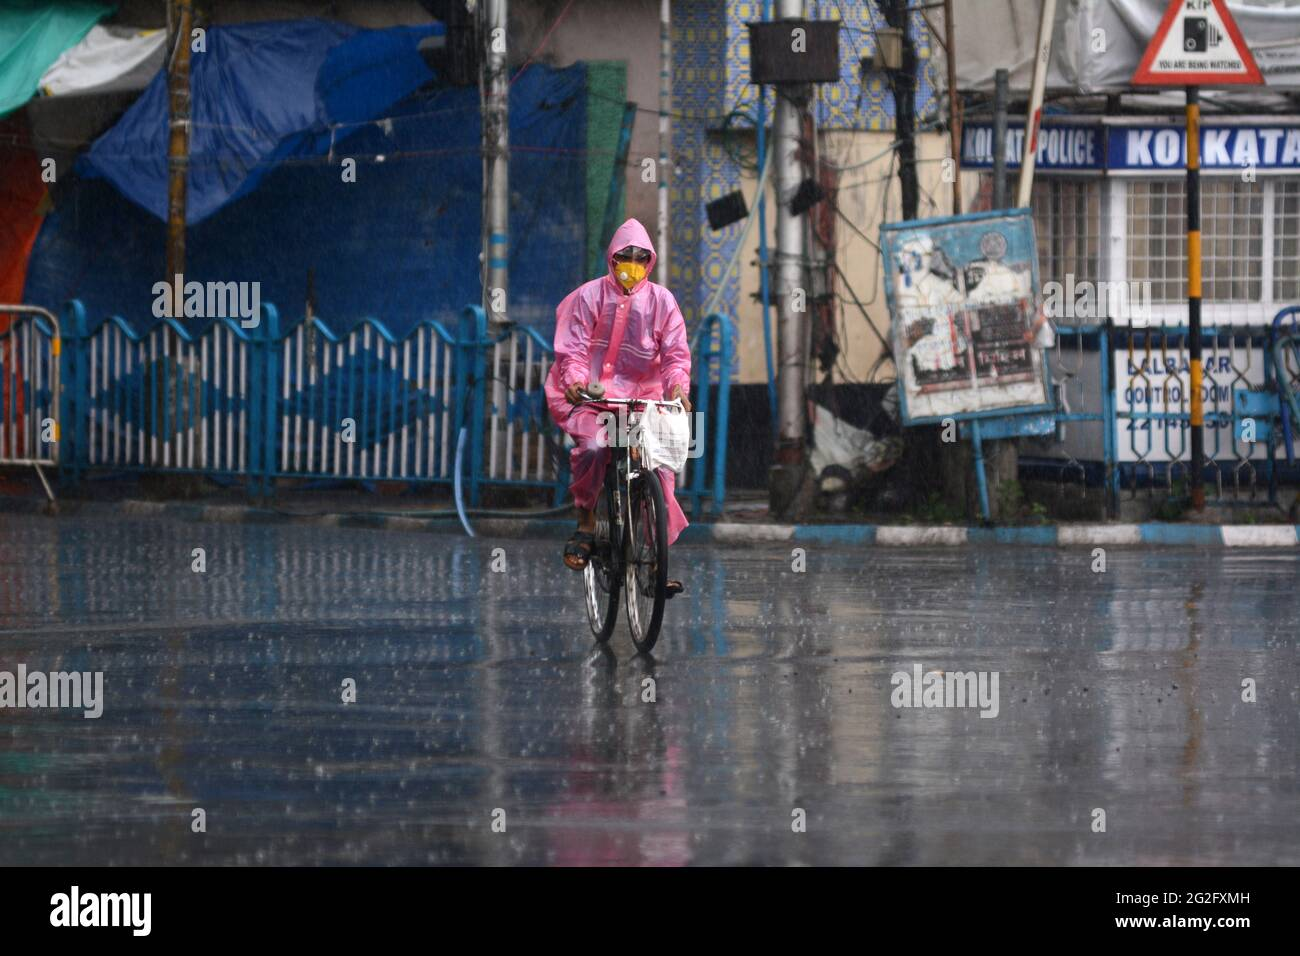 Kolkata, West Bengal, India. 11th June, 2021. A man rides a bicycle as the heavy rainfall lashes Kolkata, India. Credit: Indranil Aditya/ZUMA Wire/Alamy Live News Stock Photo